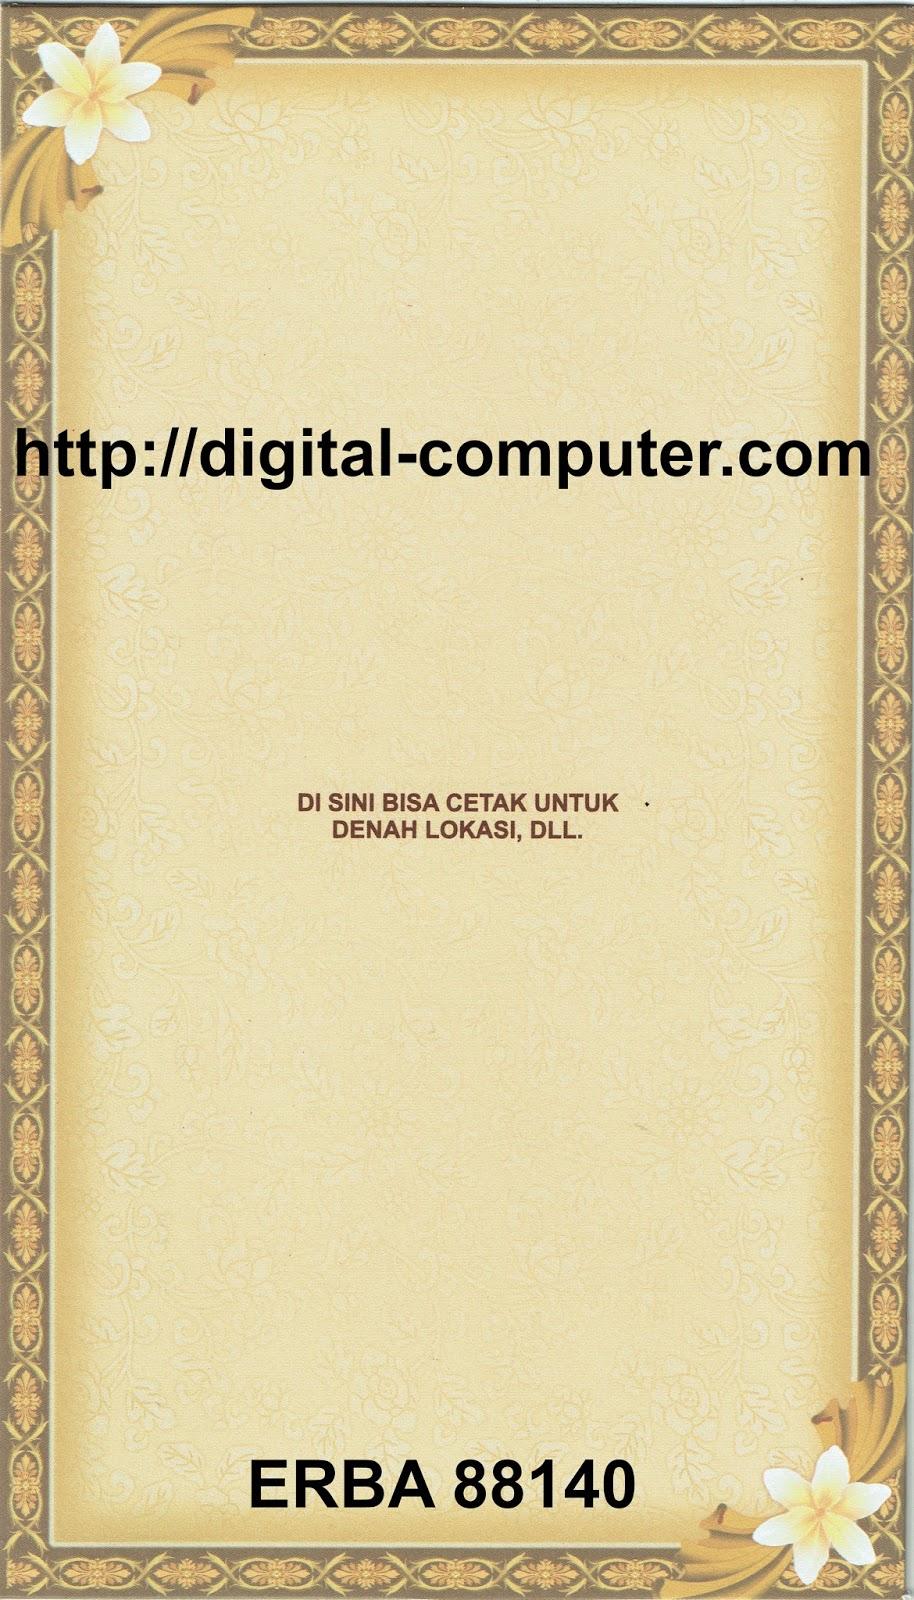 Undangan Softcover ERBA 88140